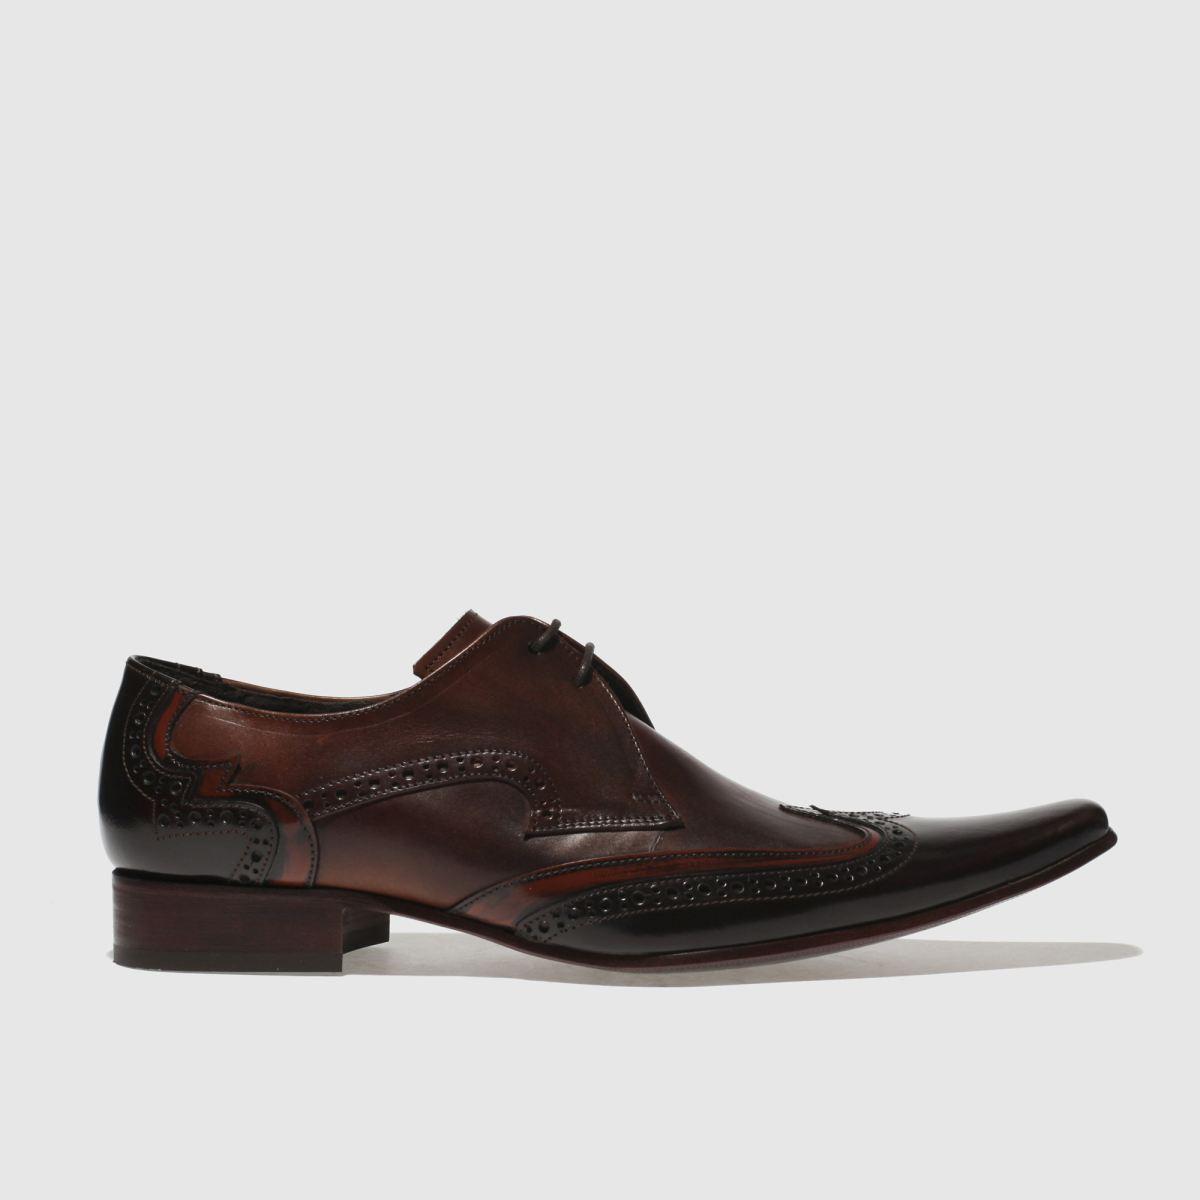 Jeffery West Dark Brown Pino Brogue Shoes